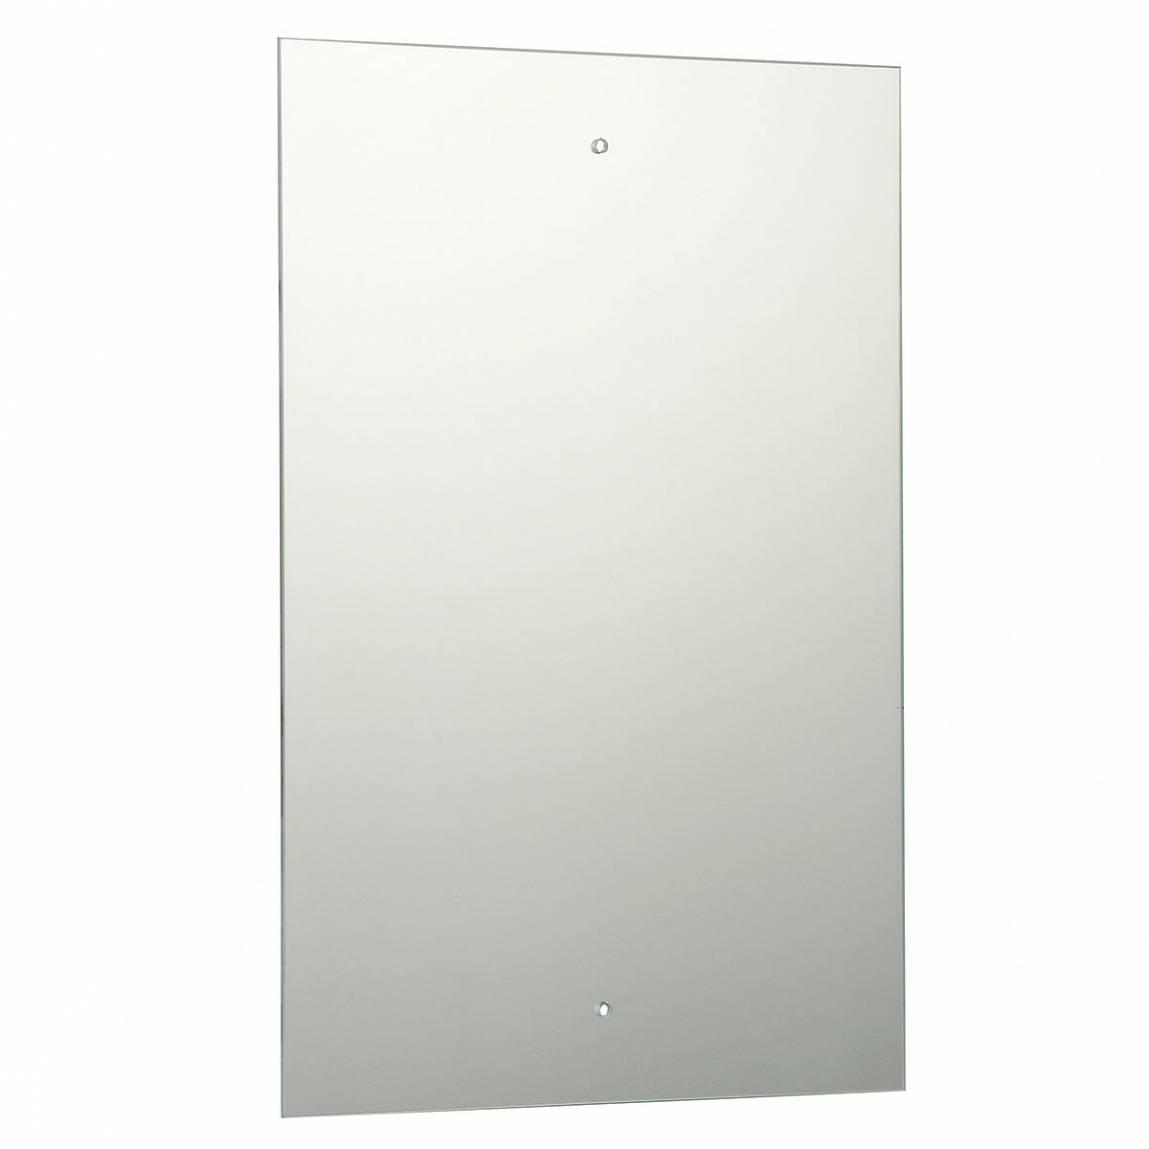 Image of Rectangular Drilled Mirror 45x30cm